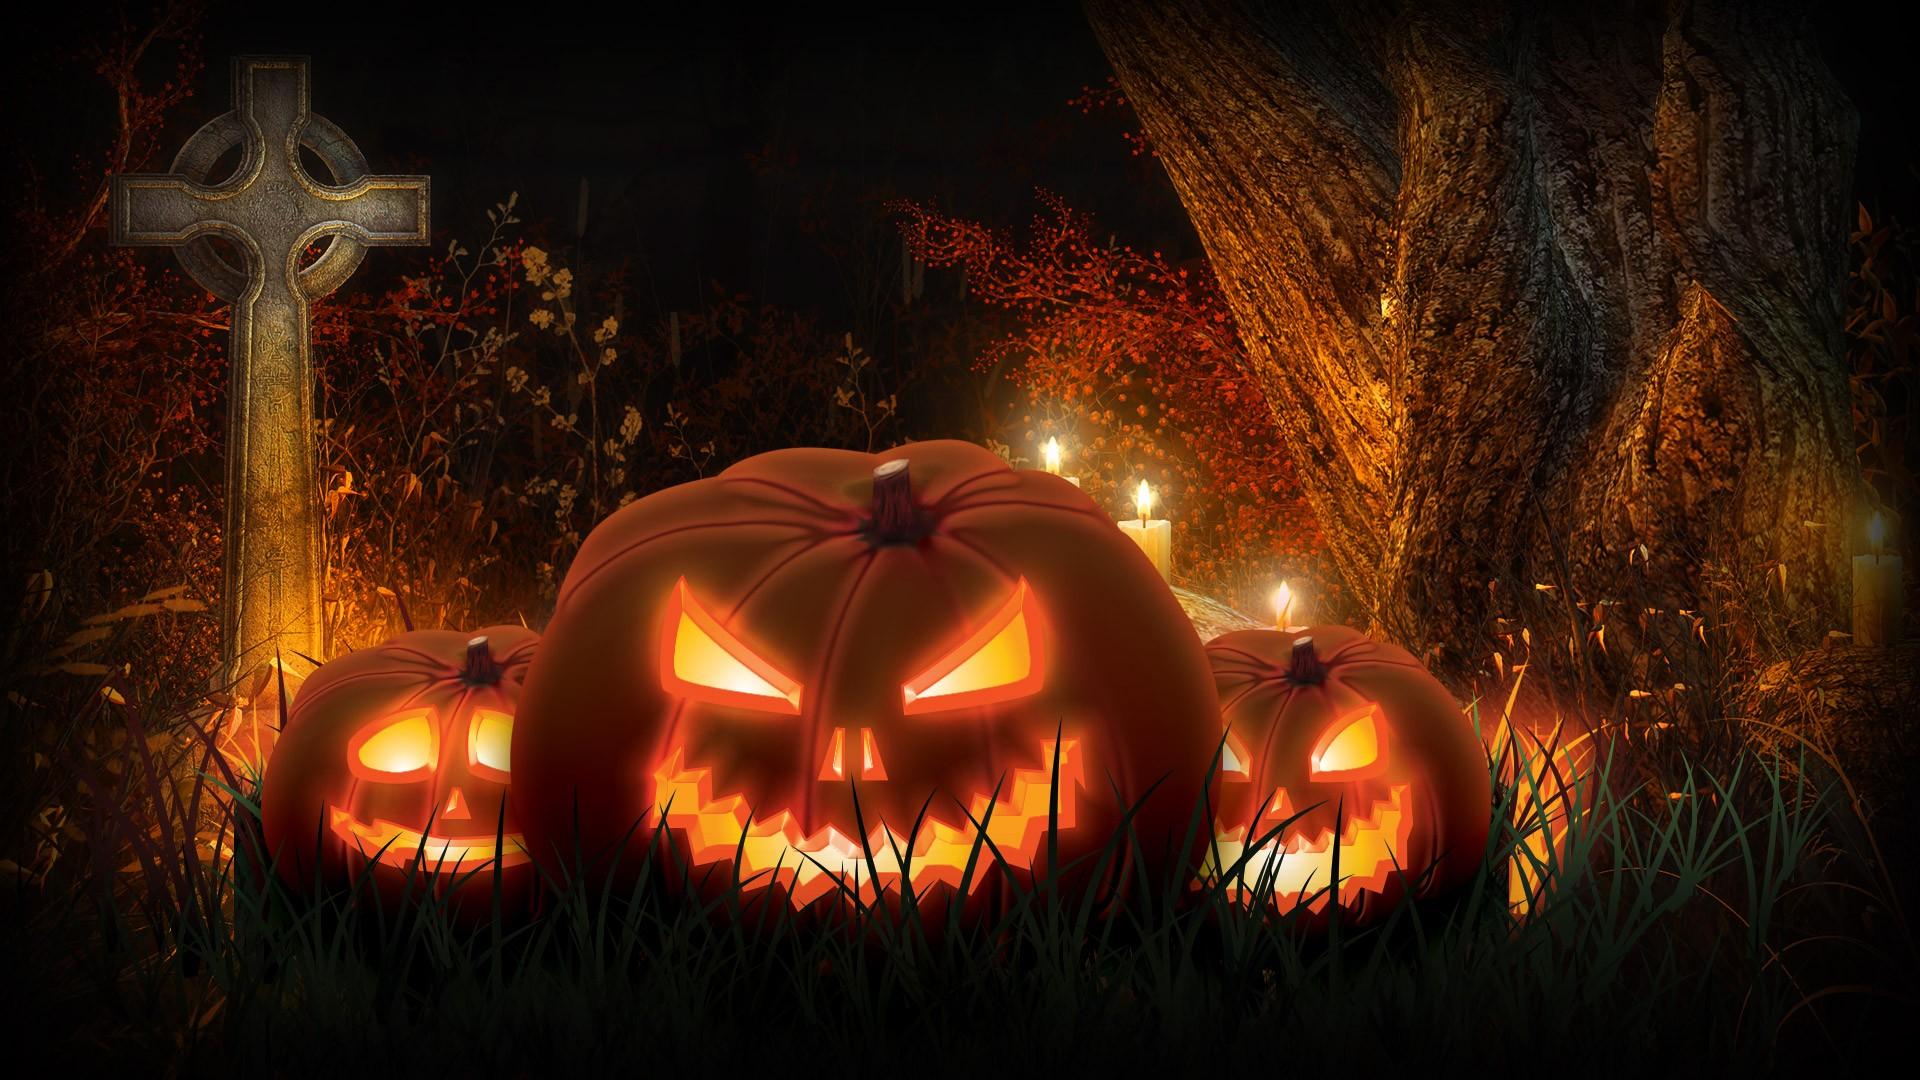 Scary Halloween HD Wallpaper - WallpaperSafari